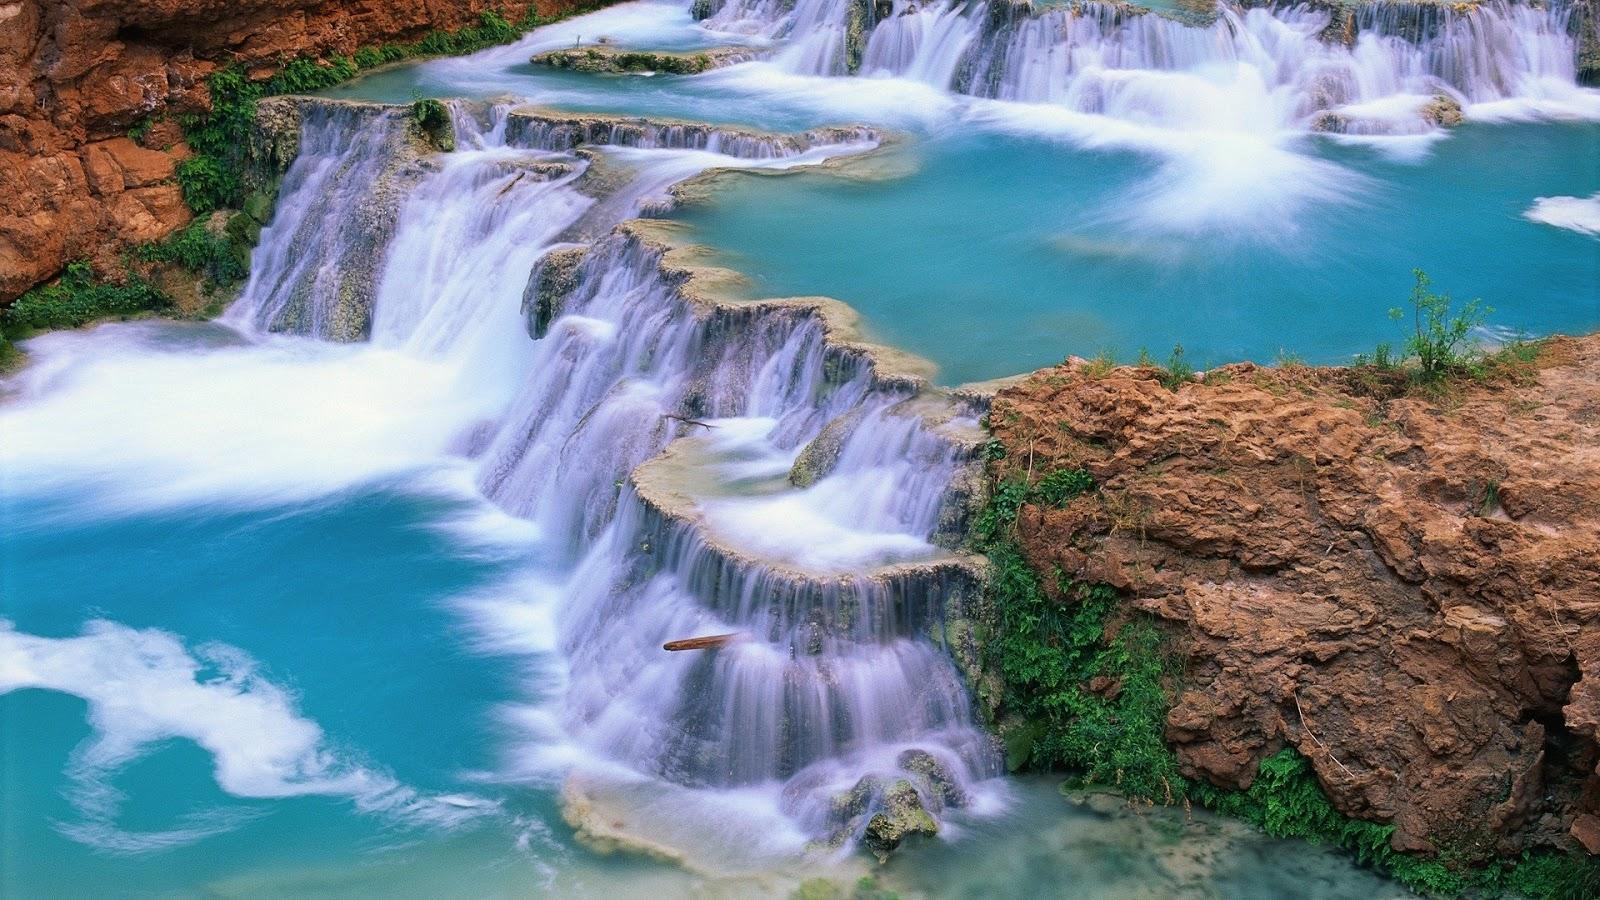 50 ] Live Waterfalls In HD Wallpapers On WallpaperSafari